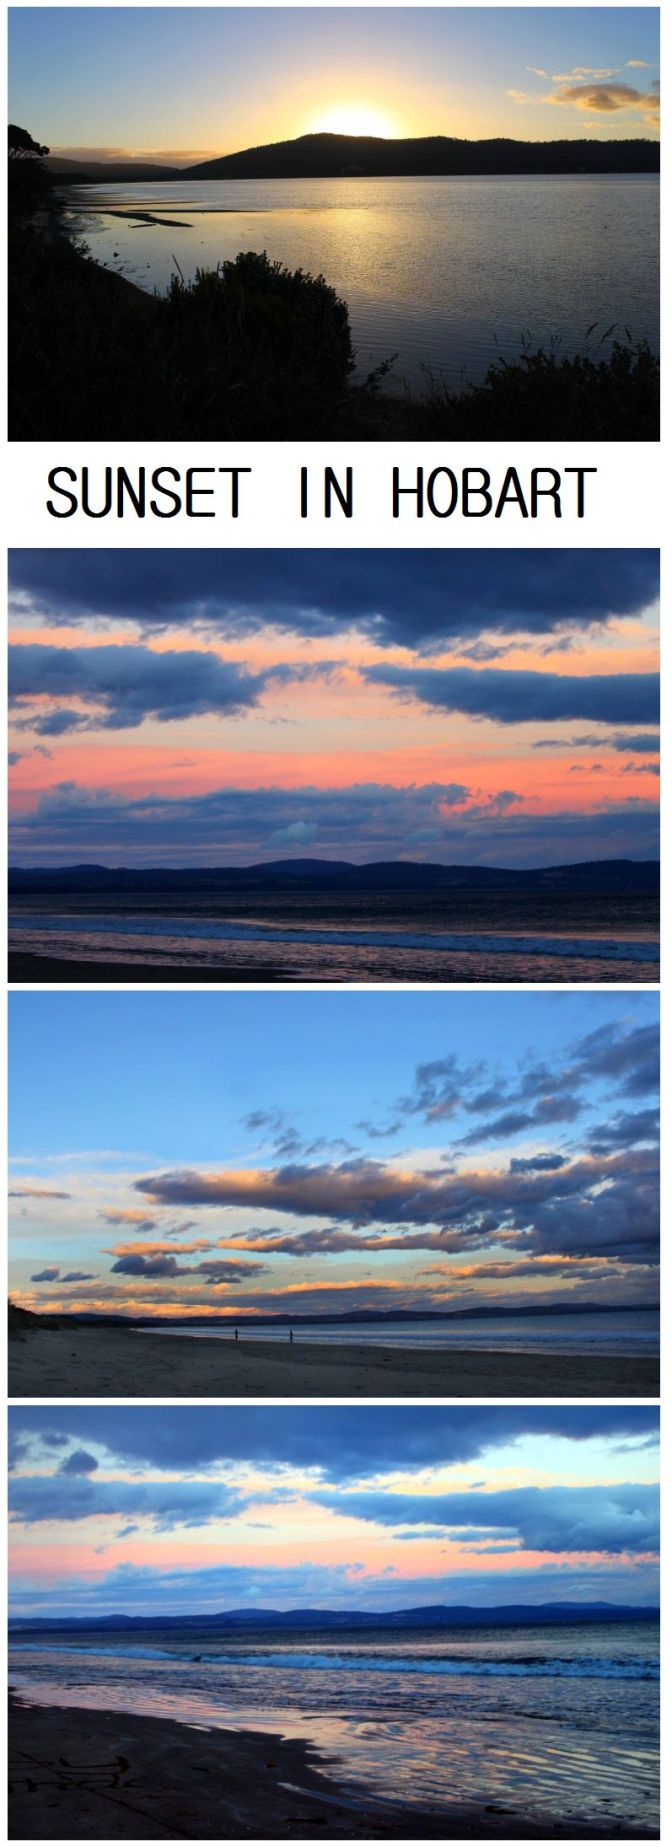 sunset in hobart tasmania - buggl.com